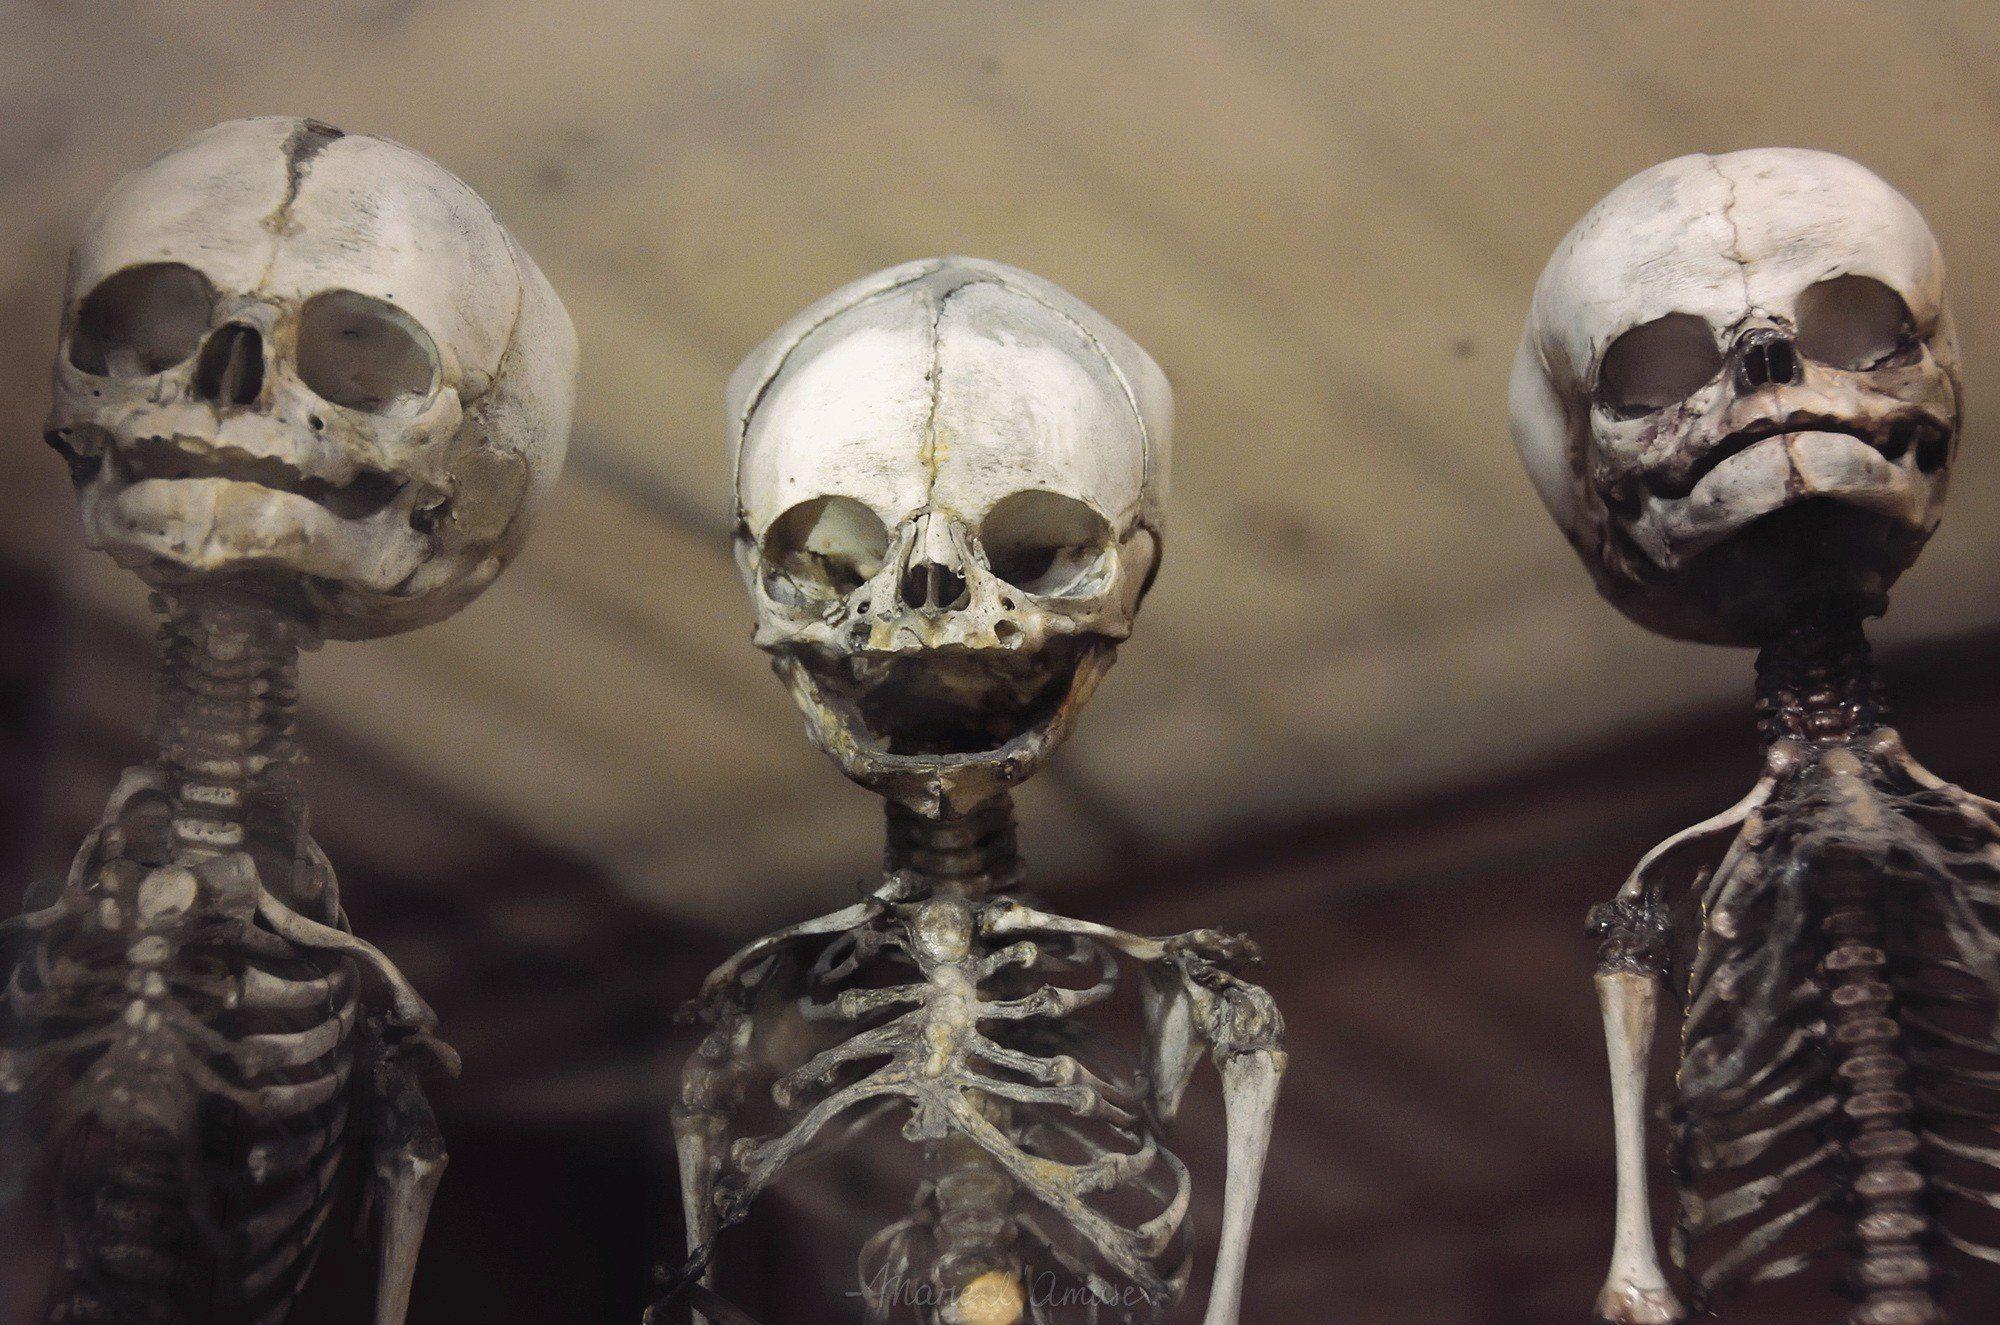 Skeleton wallpapers top free skeleton backgrounds - Skeleton wallpaper ...